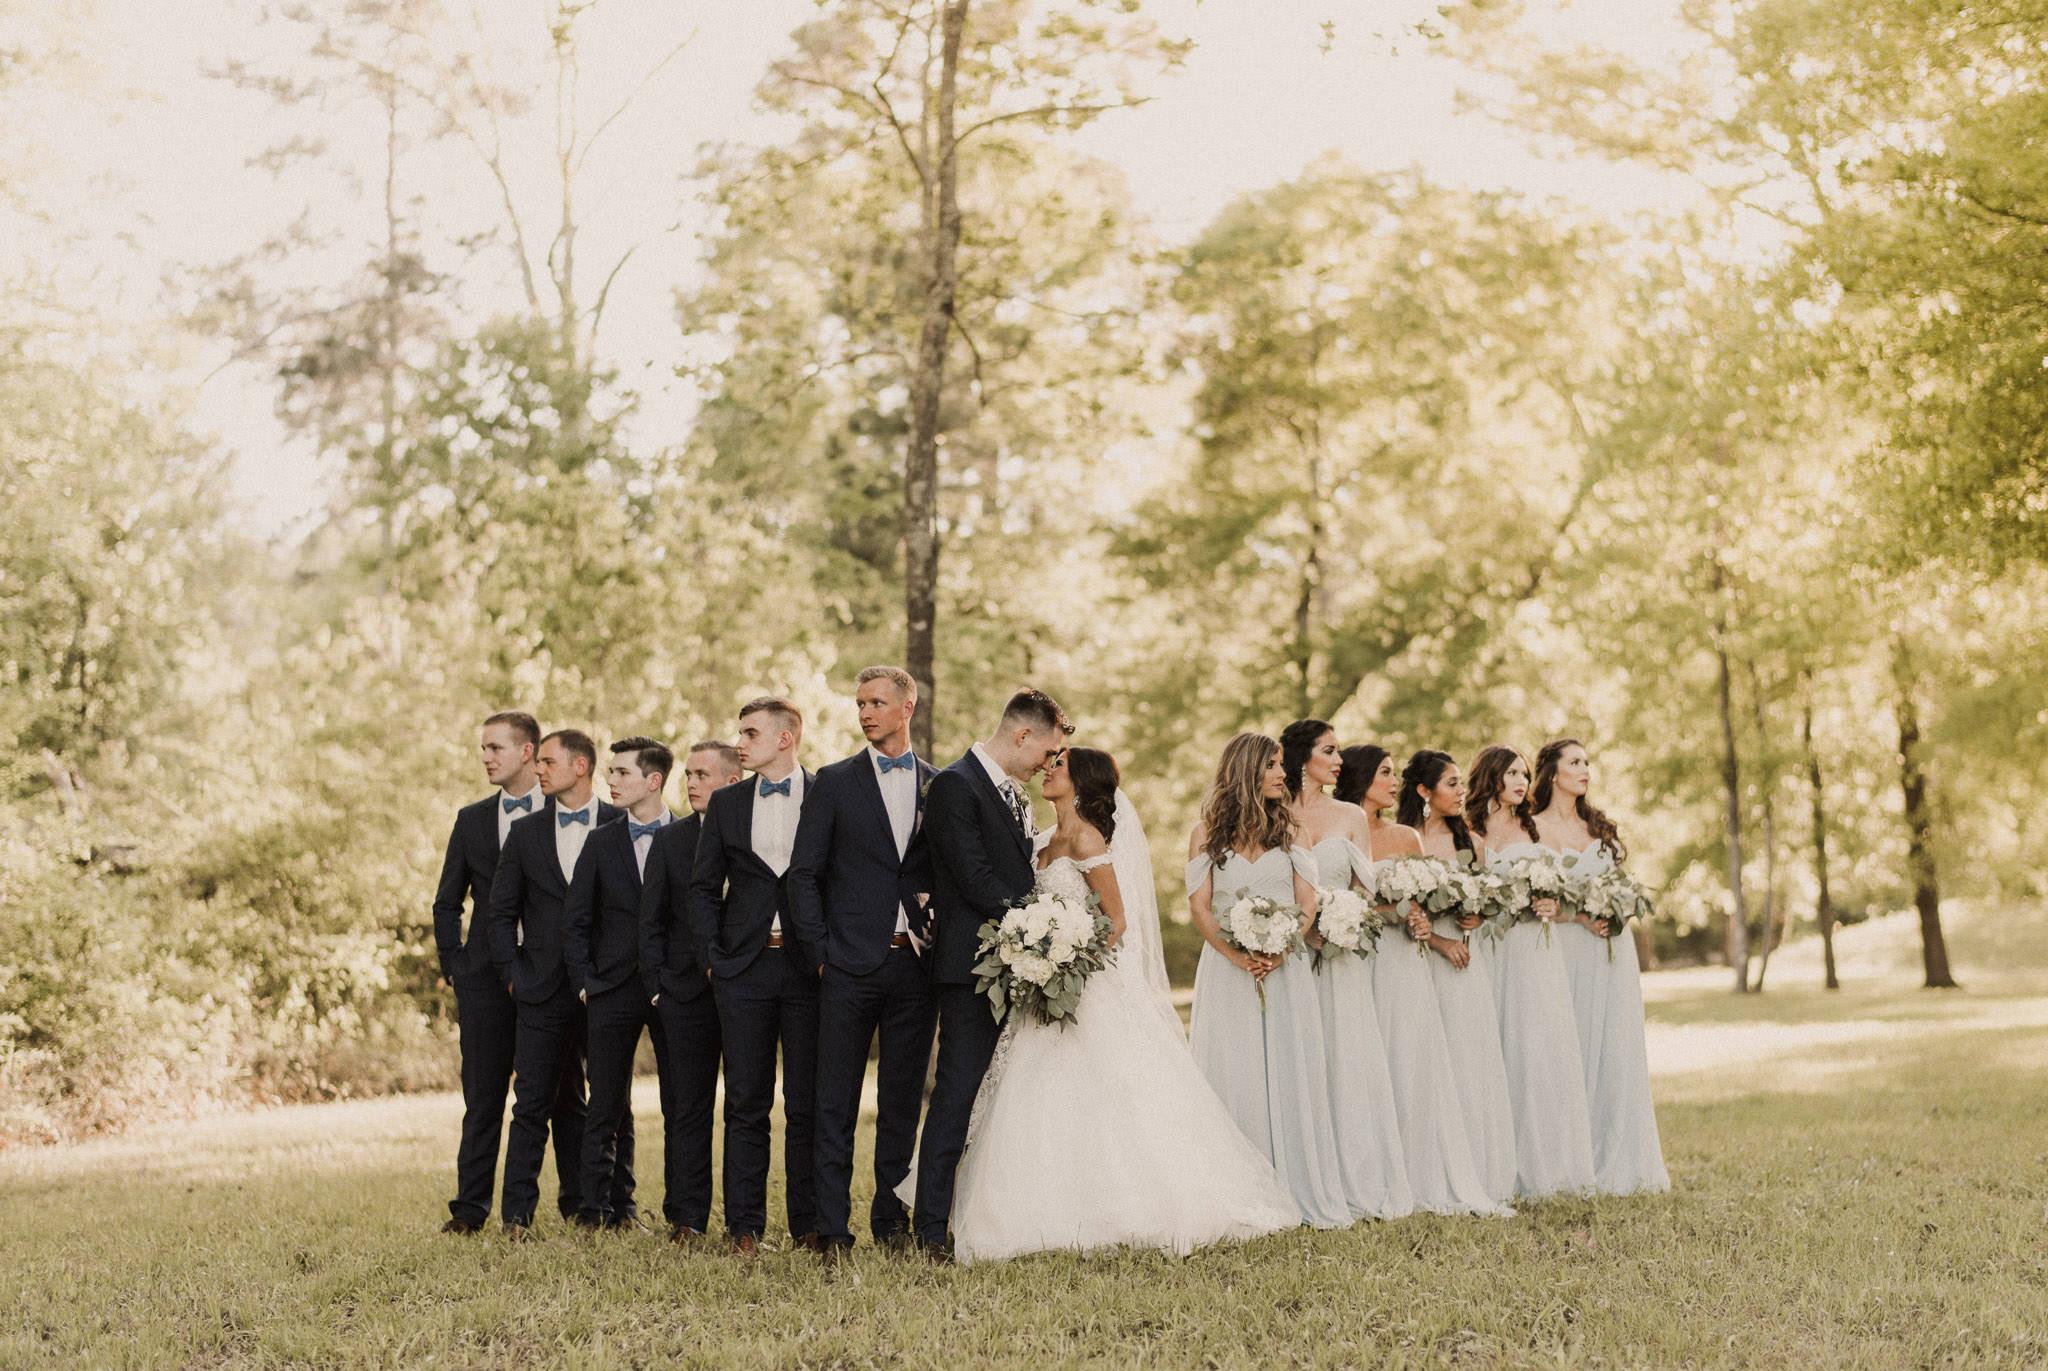 adriana-christian-wedding-re-sm-98.jpg